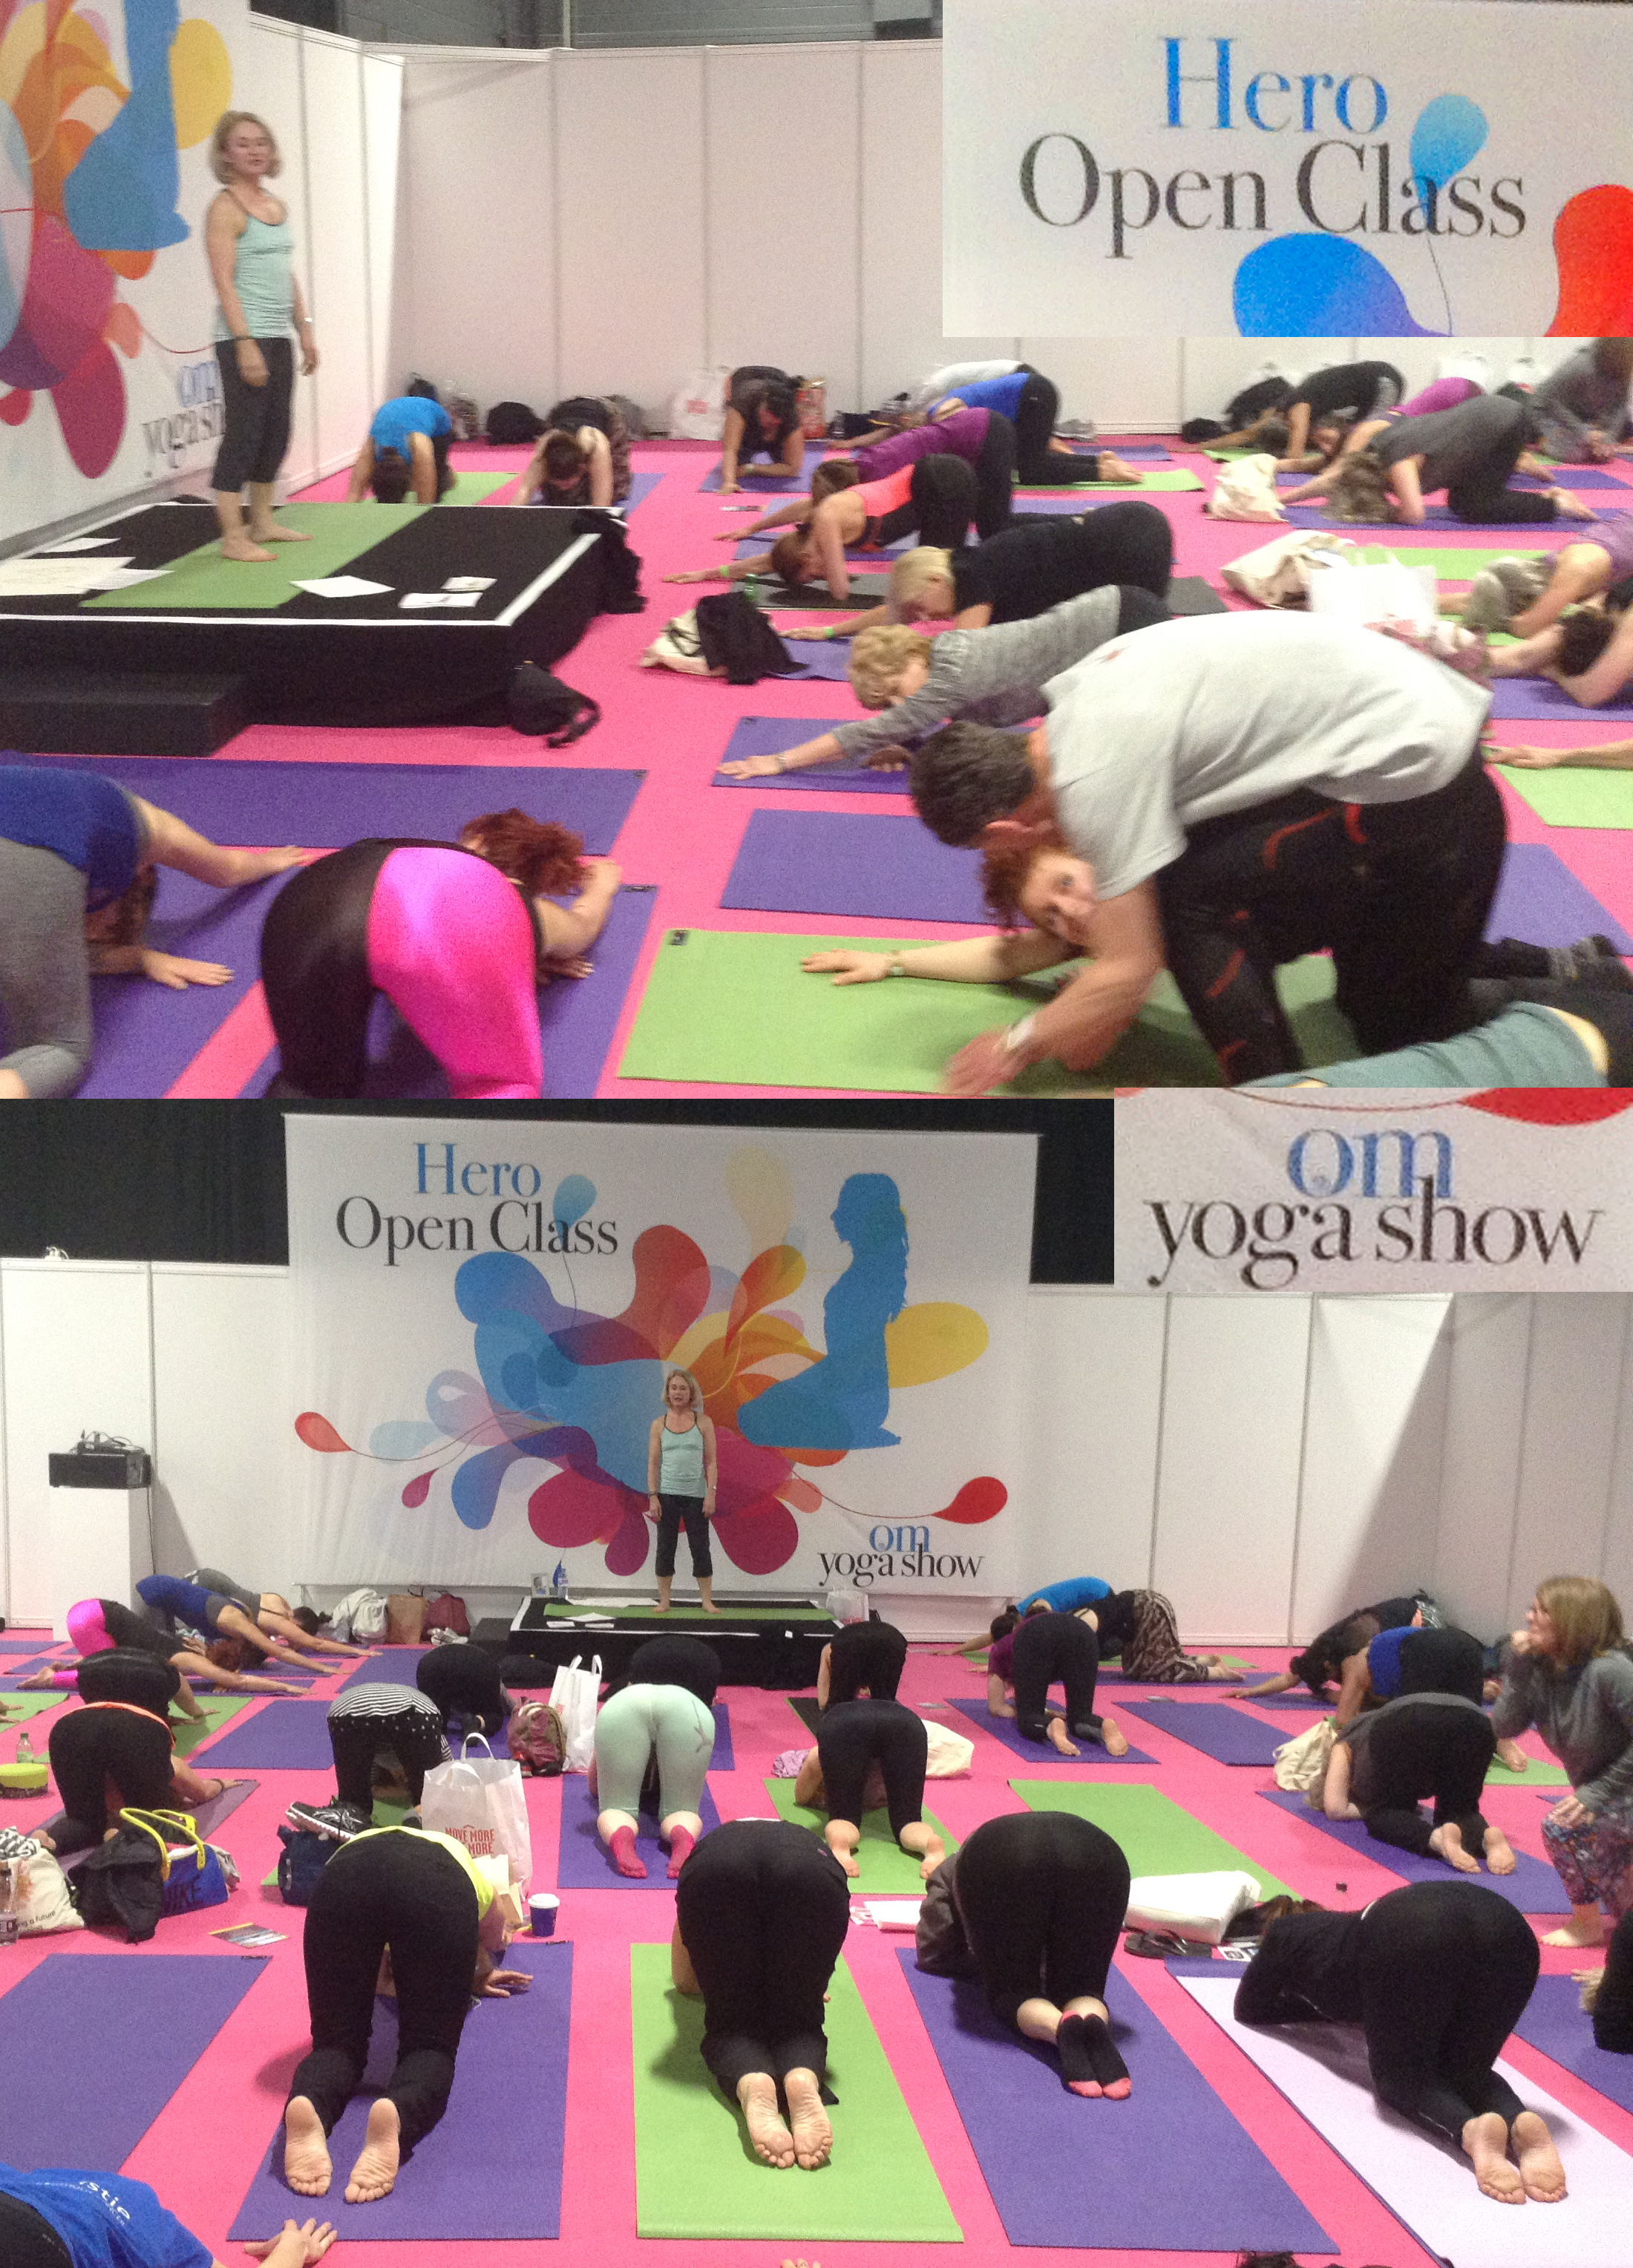 Yoga-Show-mash-upfor-web